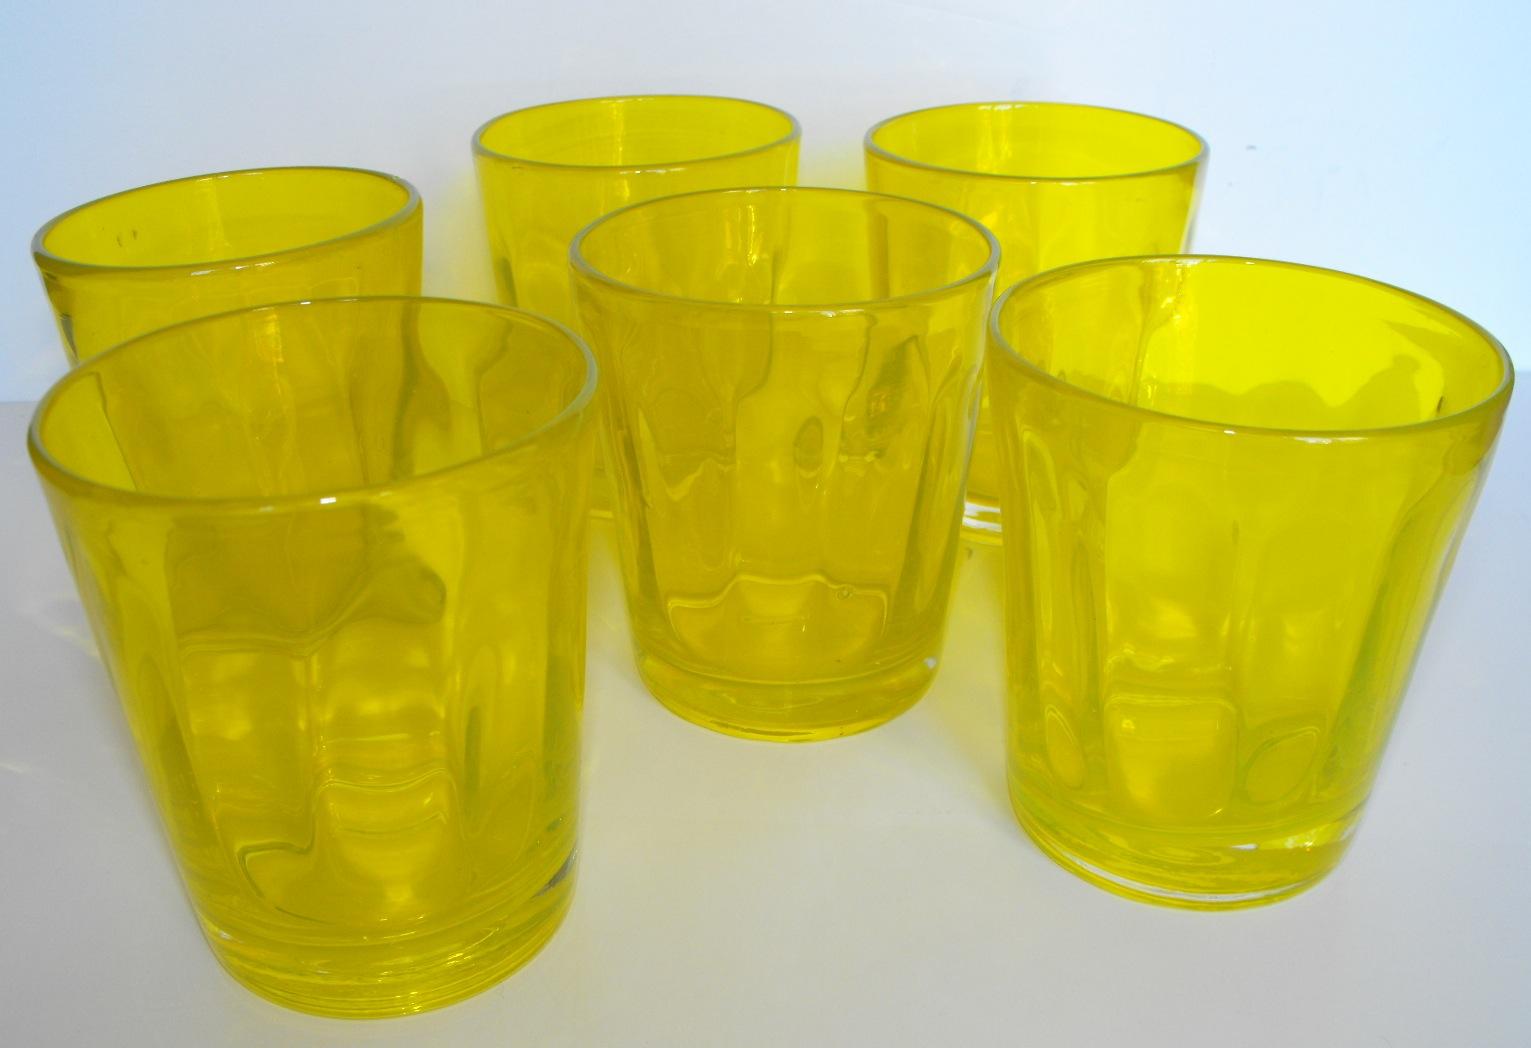 Bric brac cocina vasos y copas titchen glasses for Vasos copas vidrio